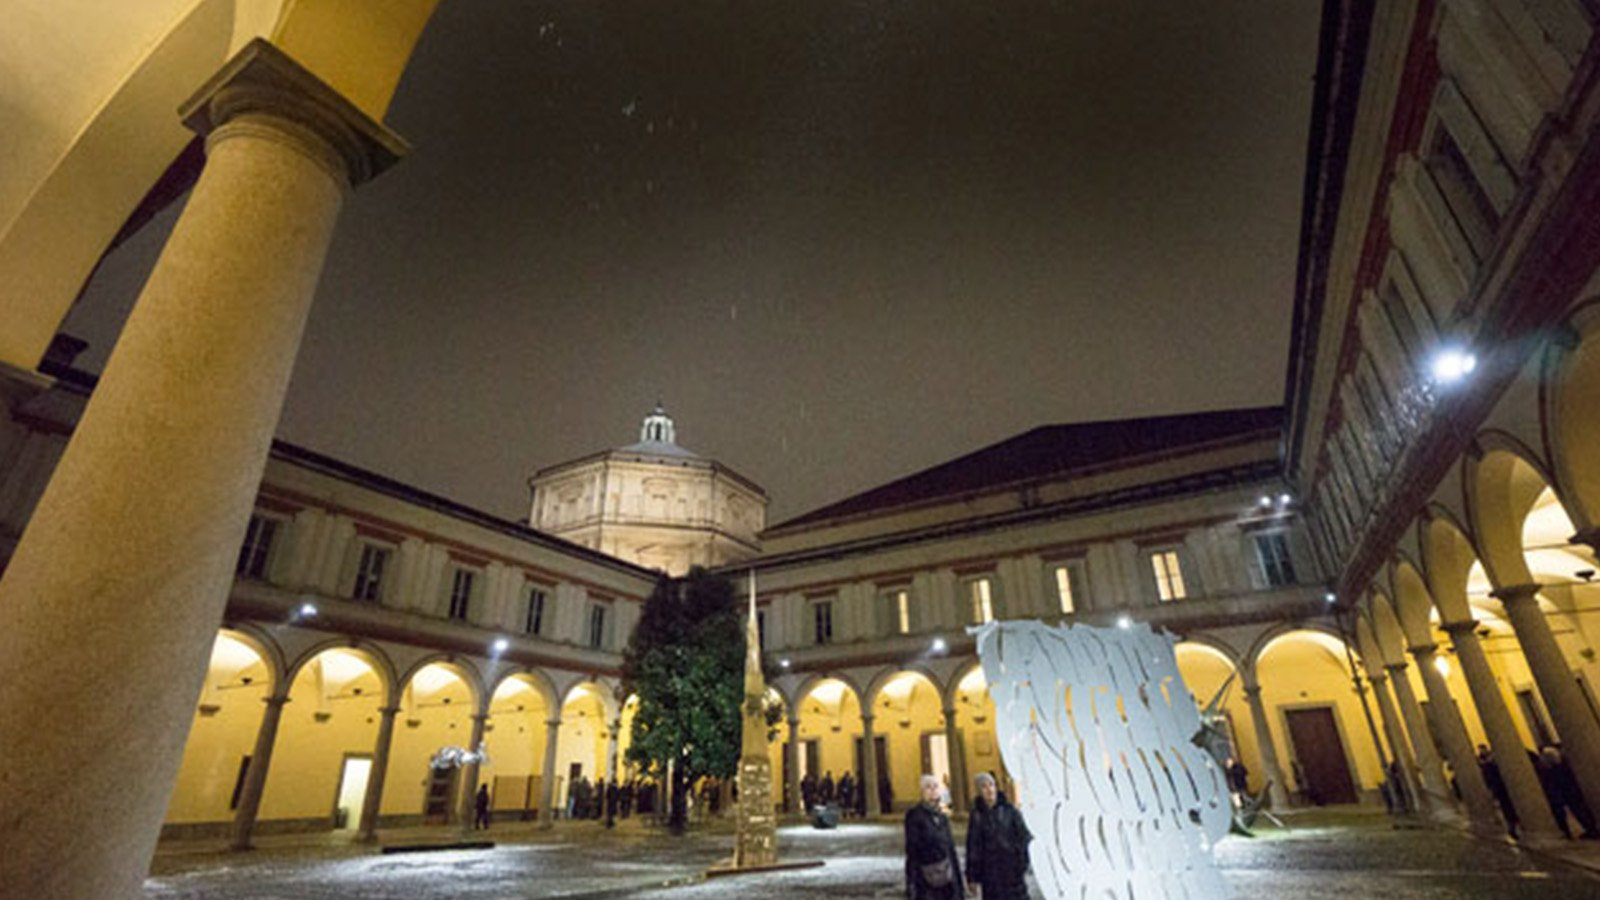 Conservatorio di Musica 'Giuseppe Verdi'